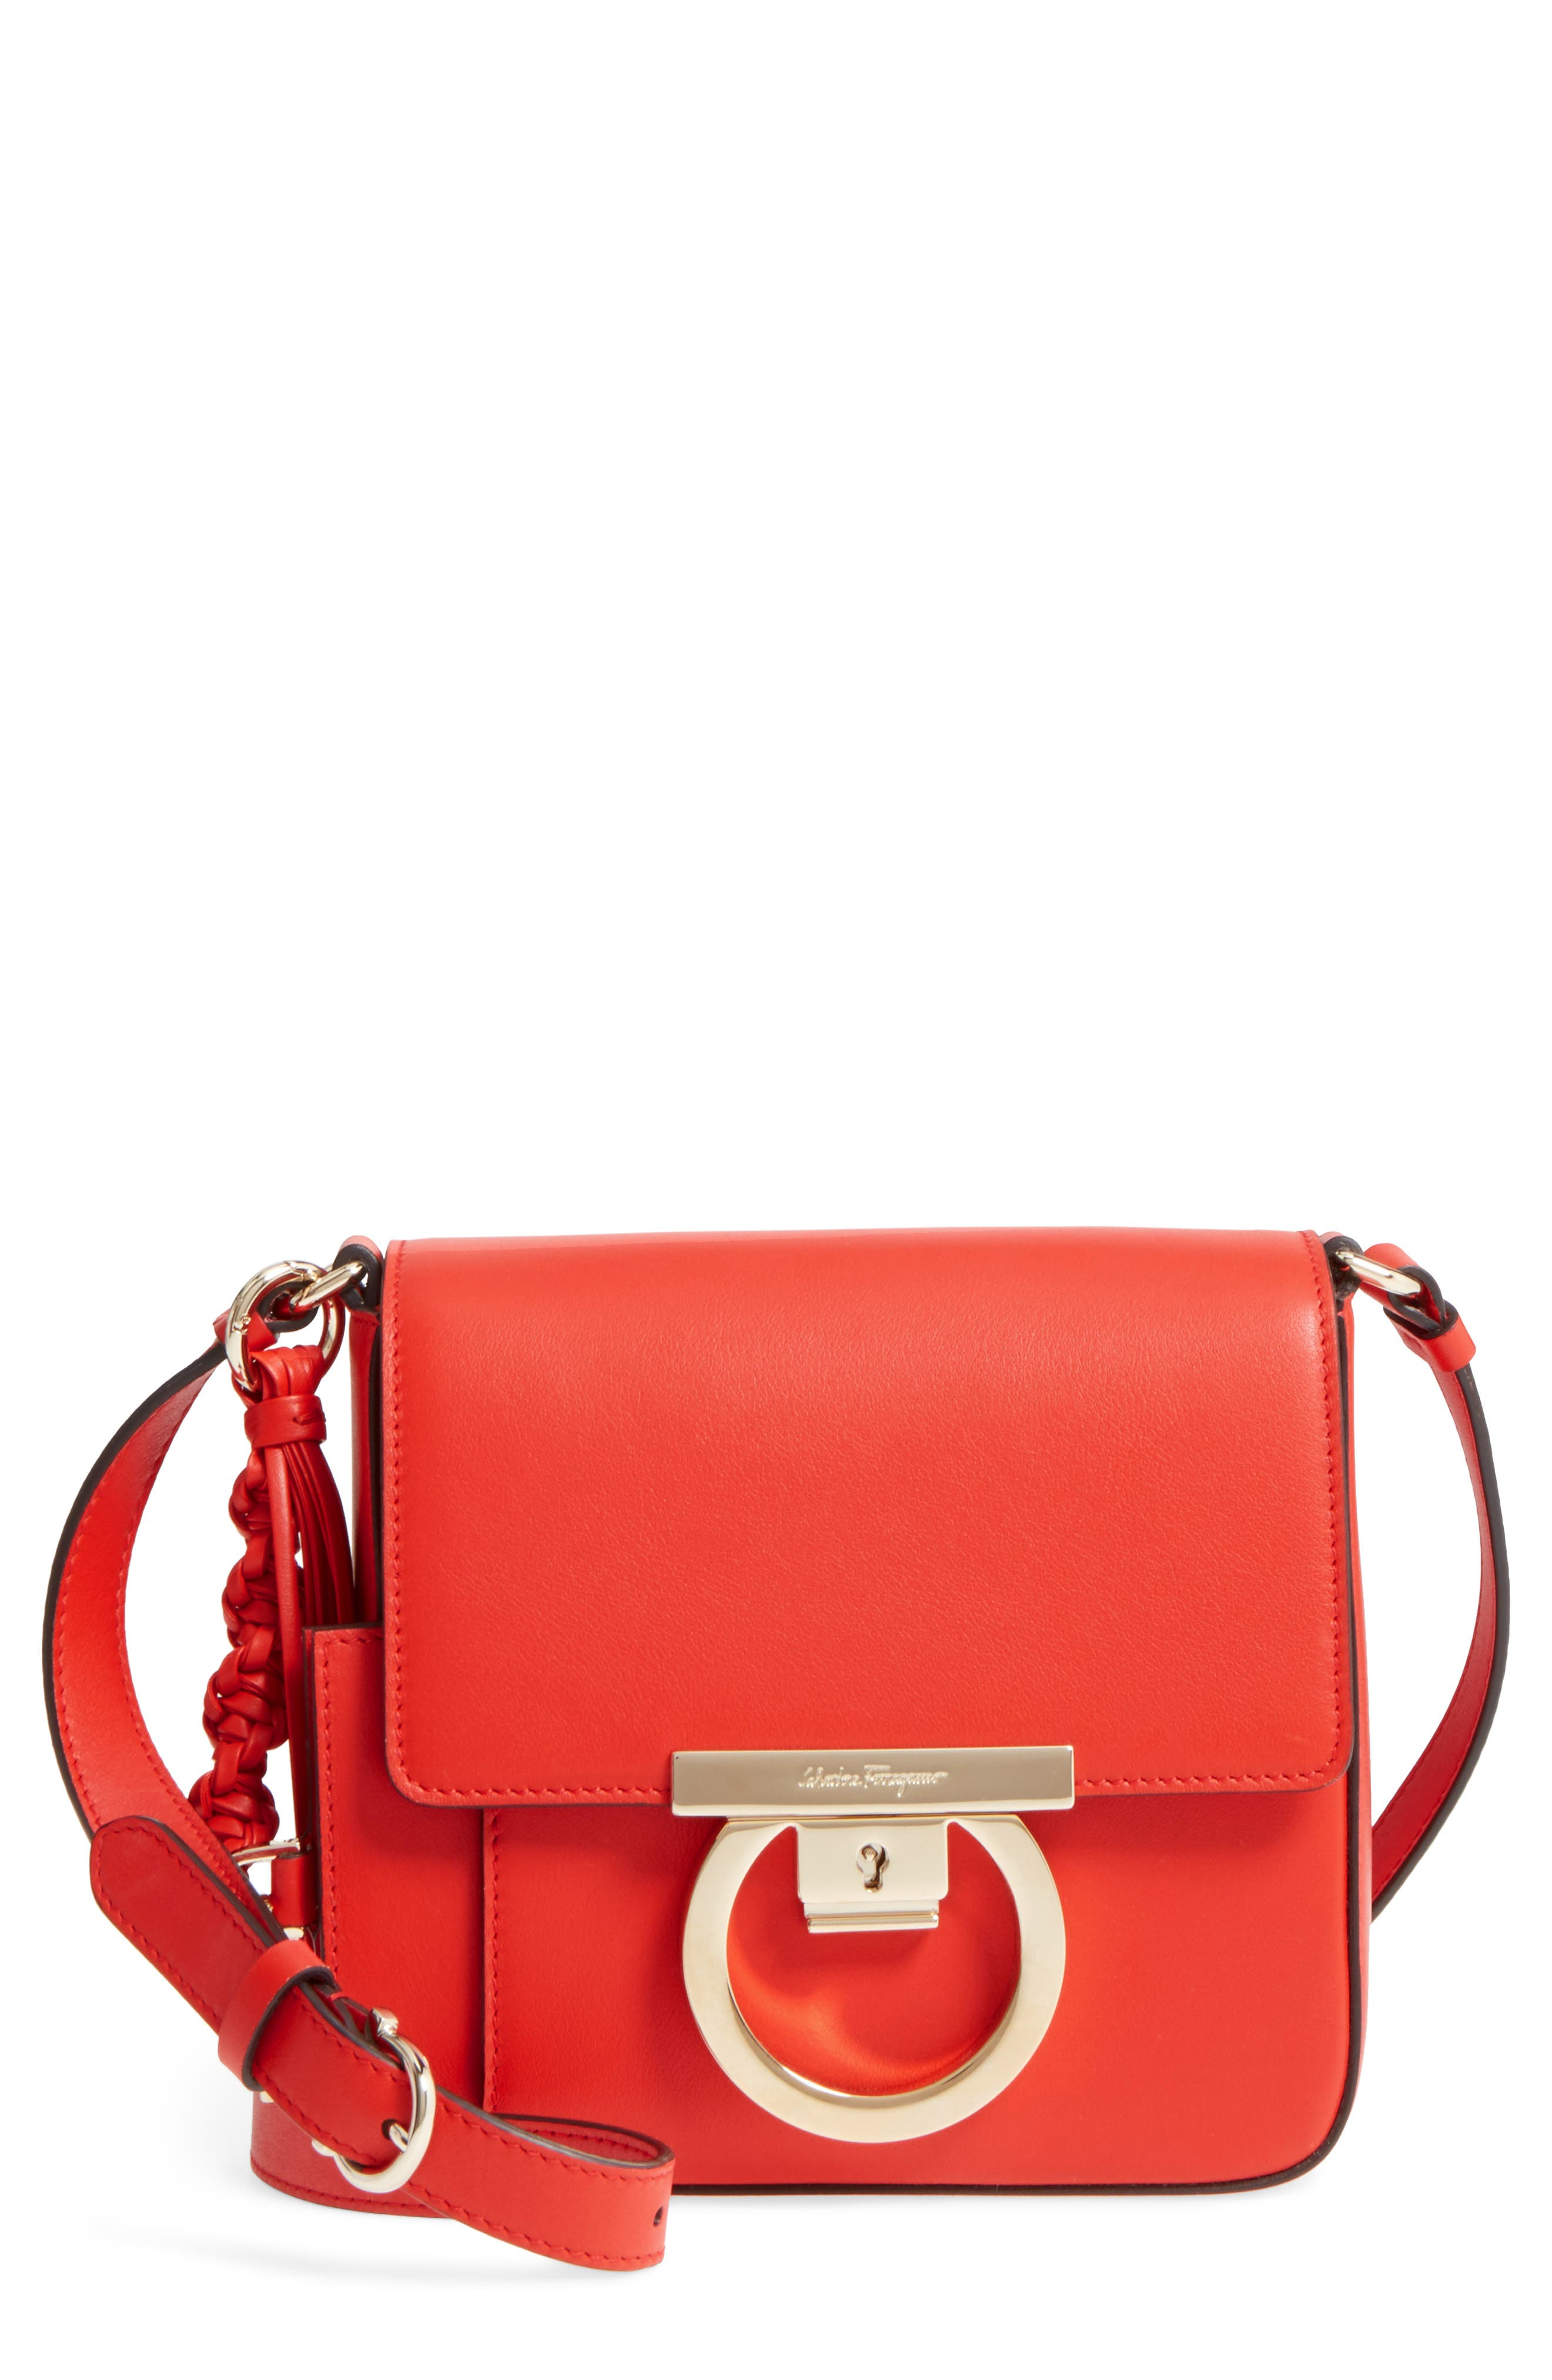 Alternate Image 1 Selected - Salvatore Ferragamo Gancio Lock Leather Crossbody Bag